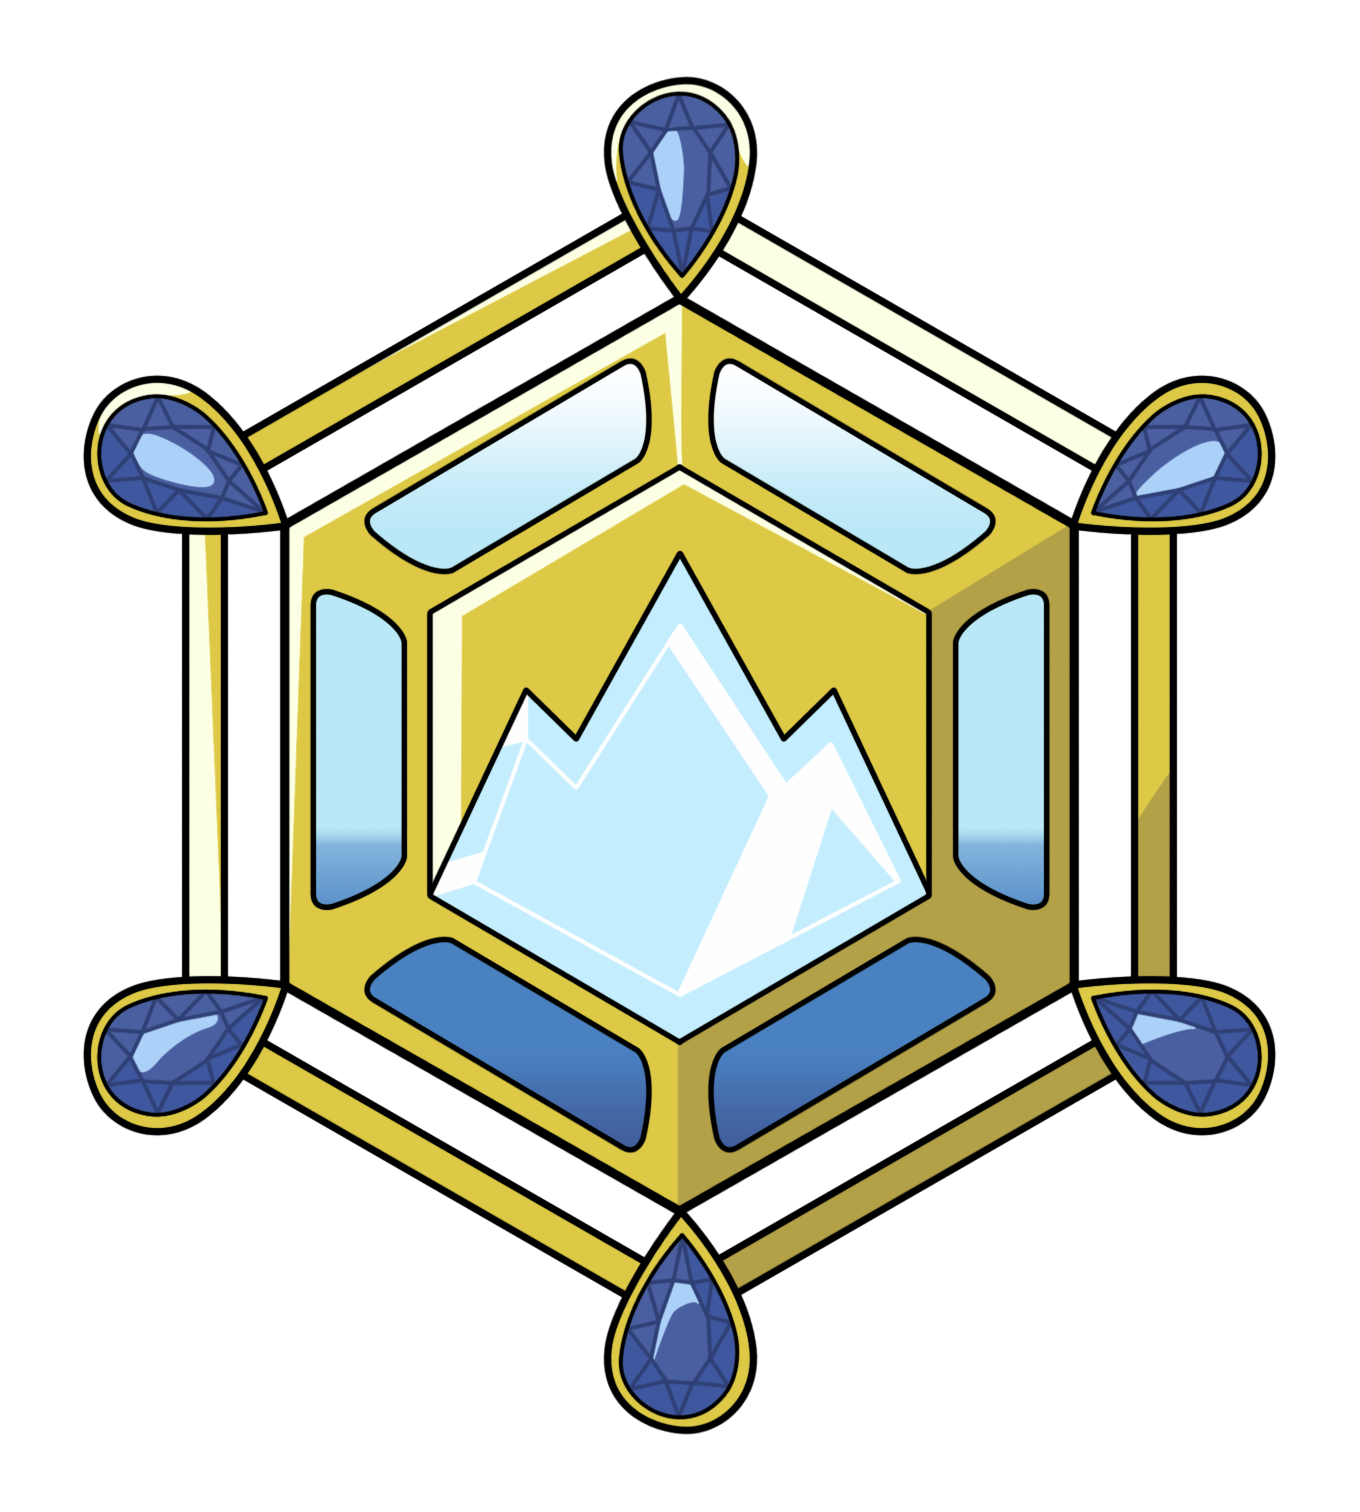 Kalos medalla by adfpf. Iceberg clipart visual